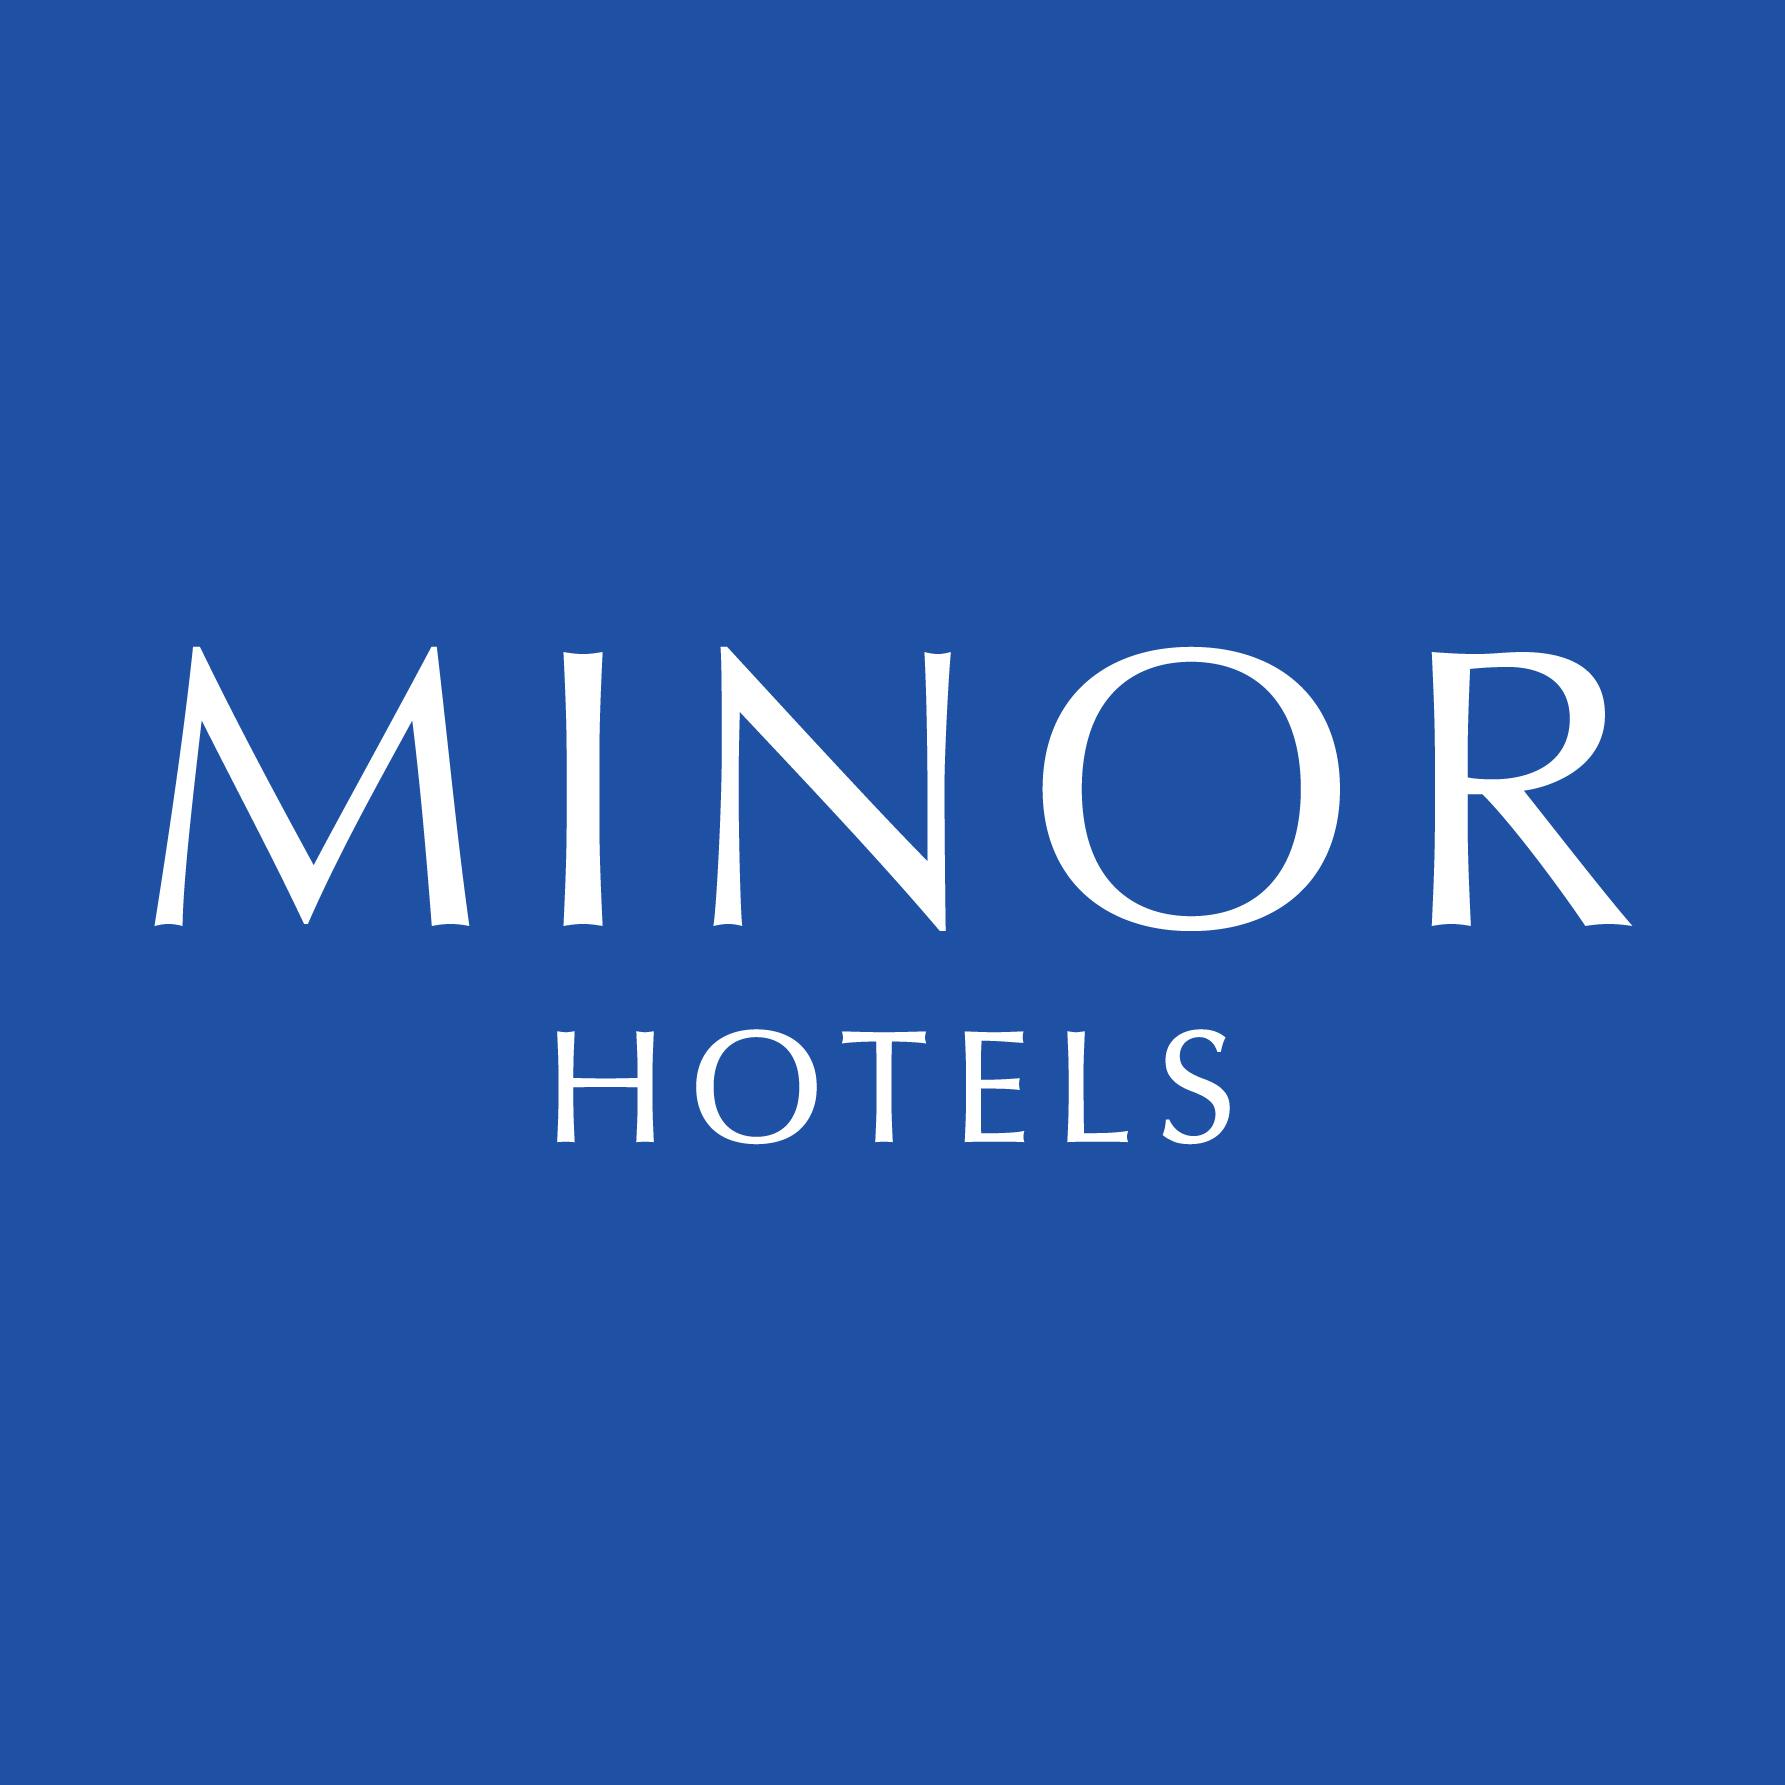 MINOR_HOTELS